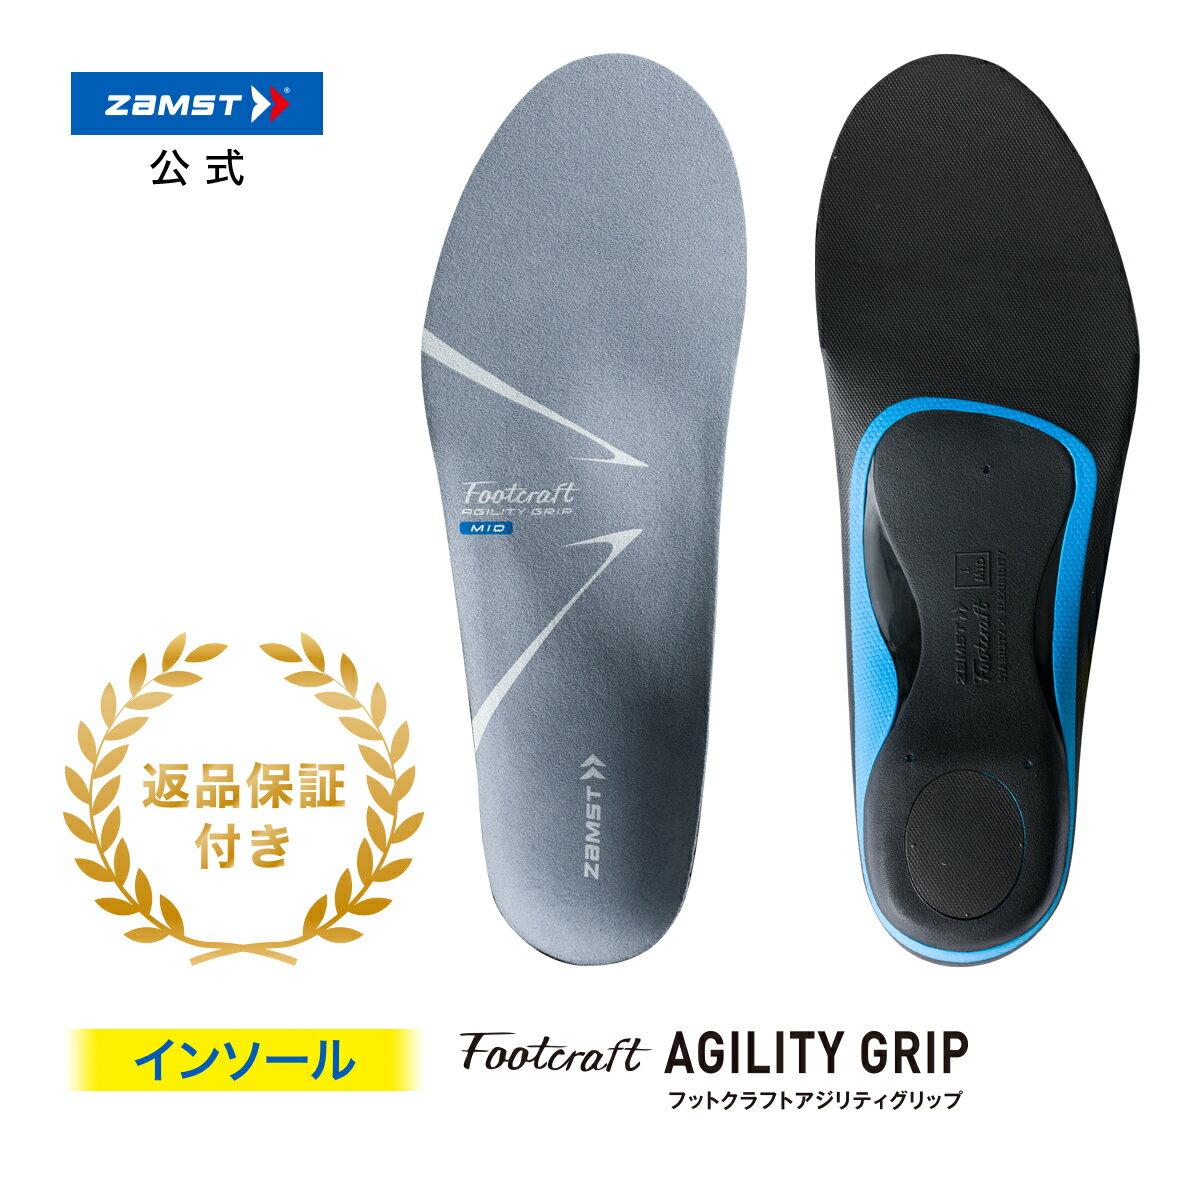 Footcraft AGILITY GRIP